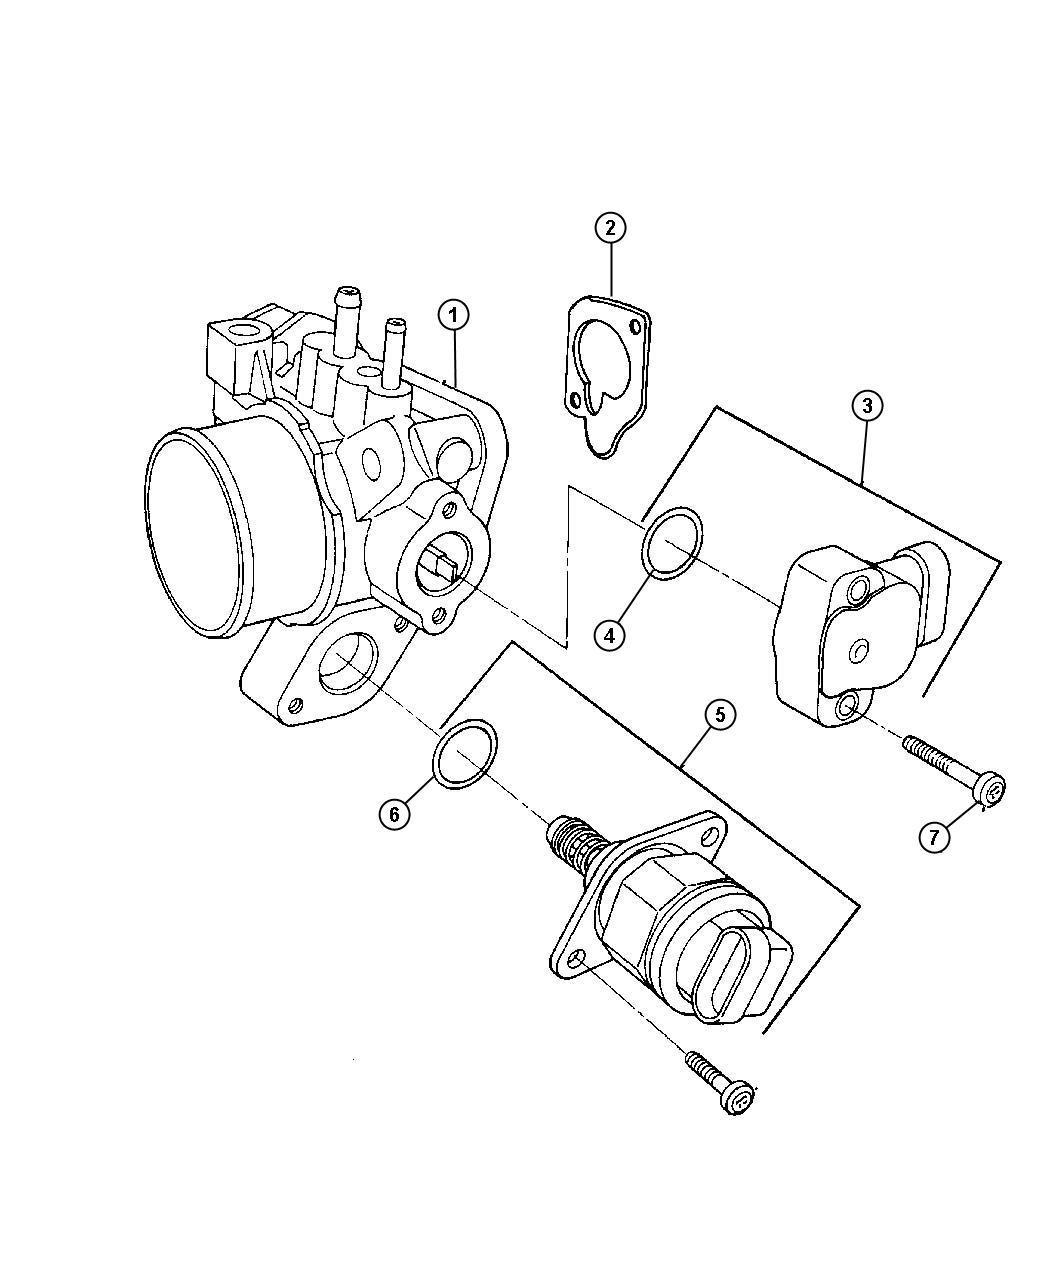 tags: #3800 series 3 engine diagram#gm 3#3800 series 1 engine diagram#3800  series 2 engine vacuum diagram#1998 gm 3800 engine schematics#3800 series  ii